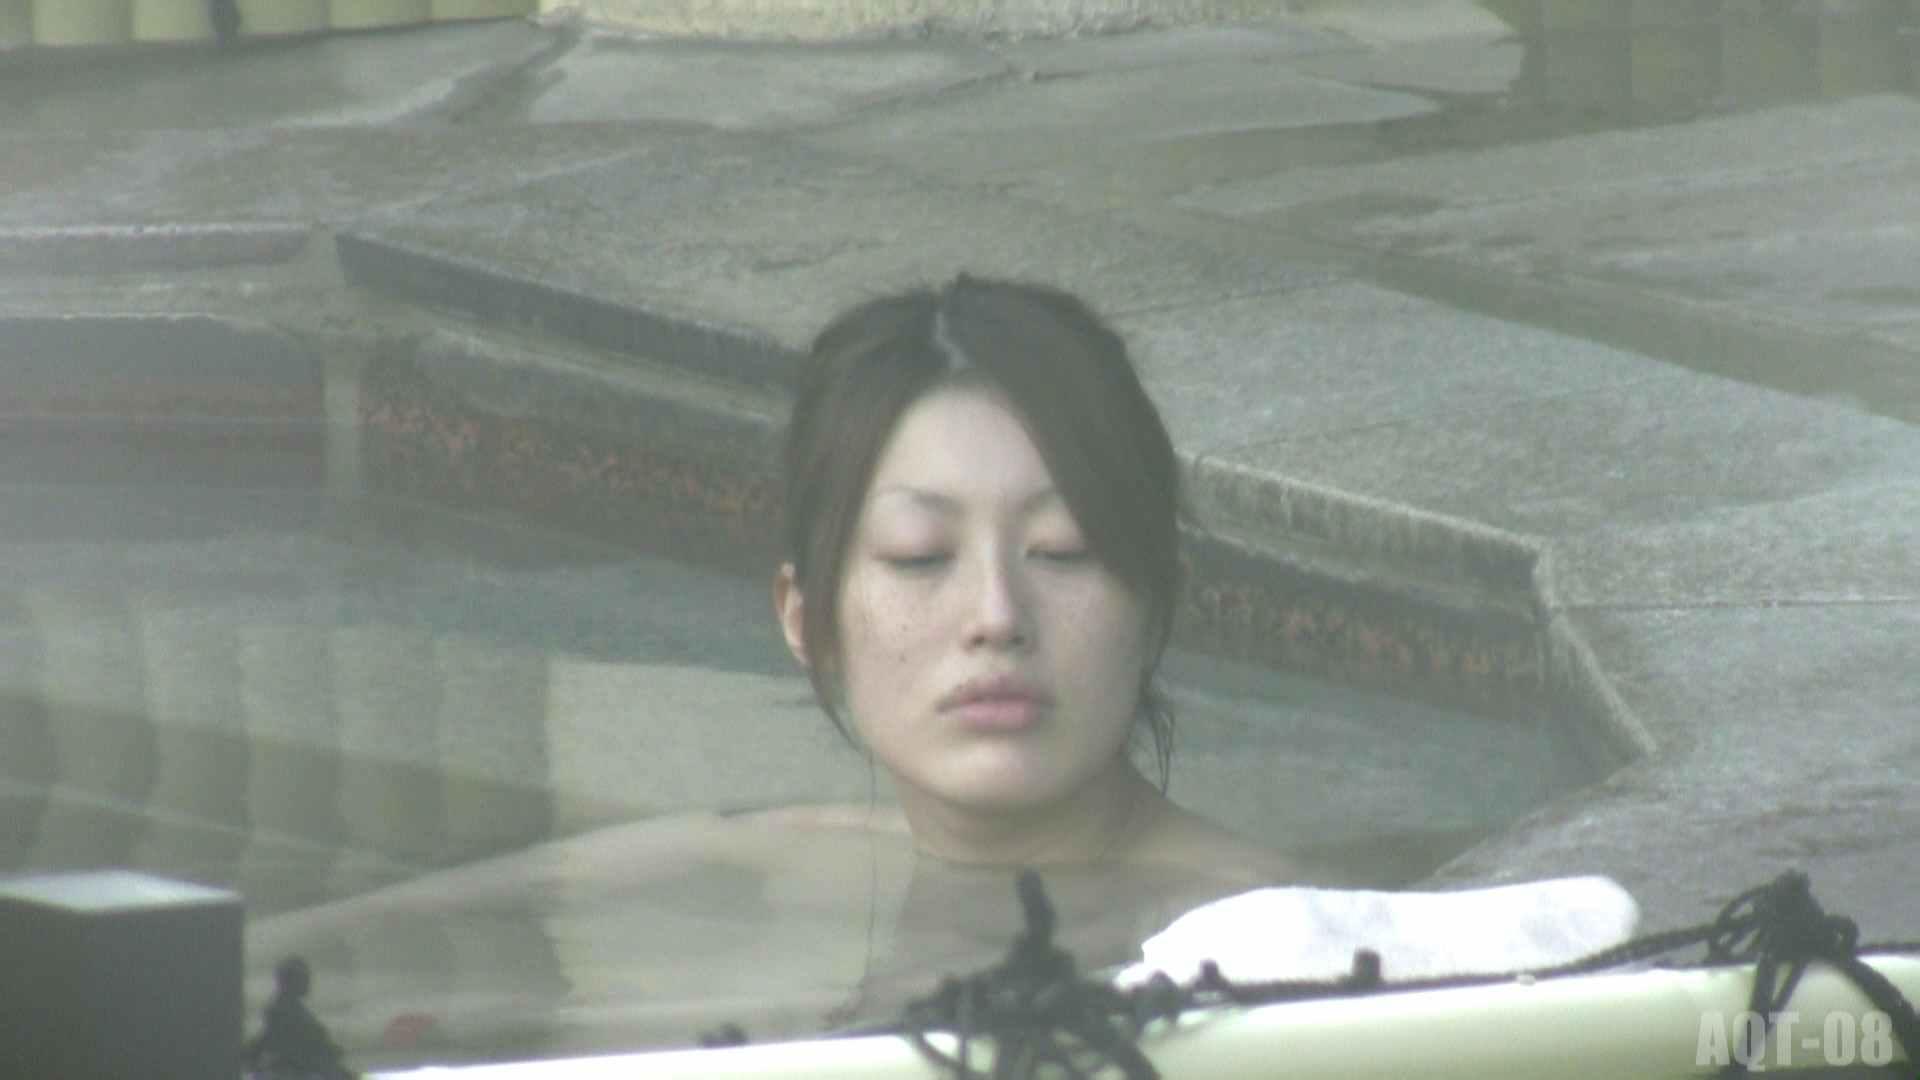 Aquaな露天風呂Vol.775 盗撮映像  74Pix 49